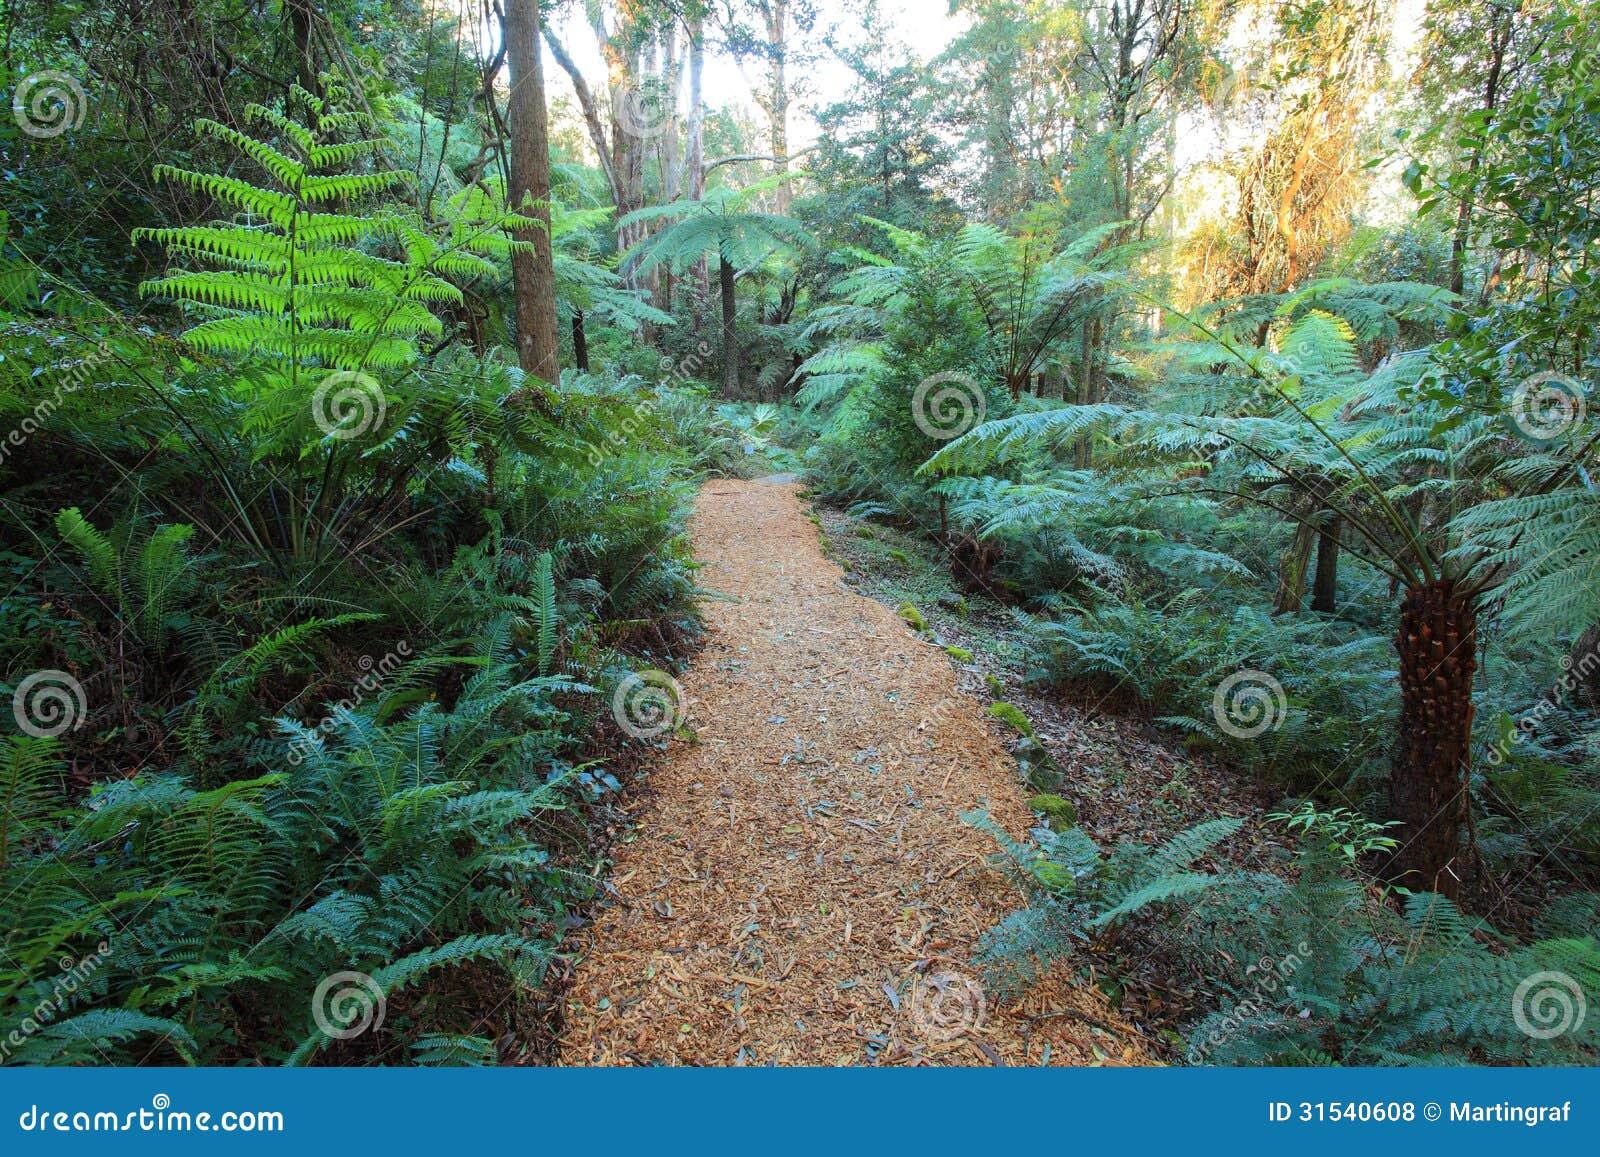 Gondwana Rainforest With Woodchip Path Royalty Free Stock